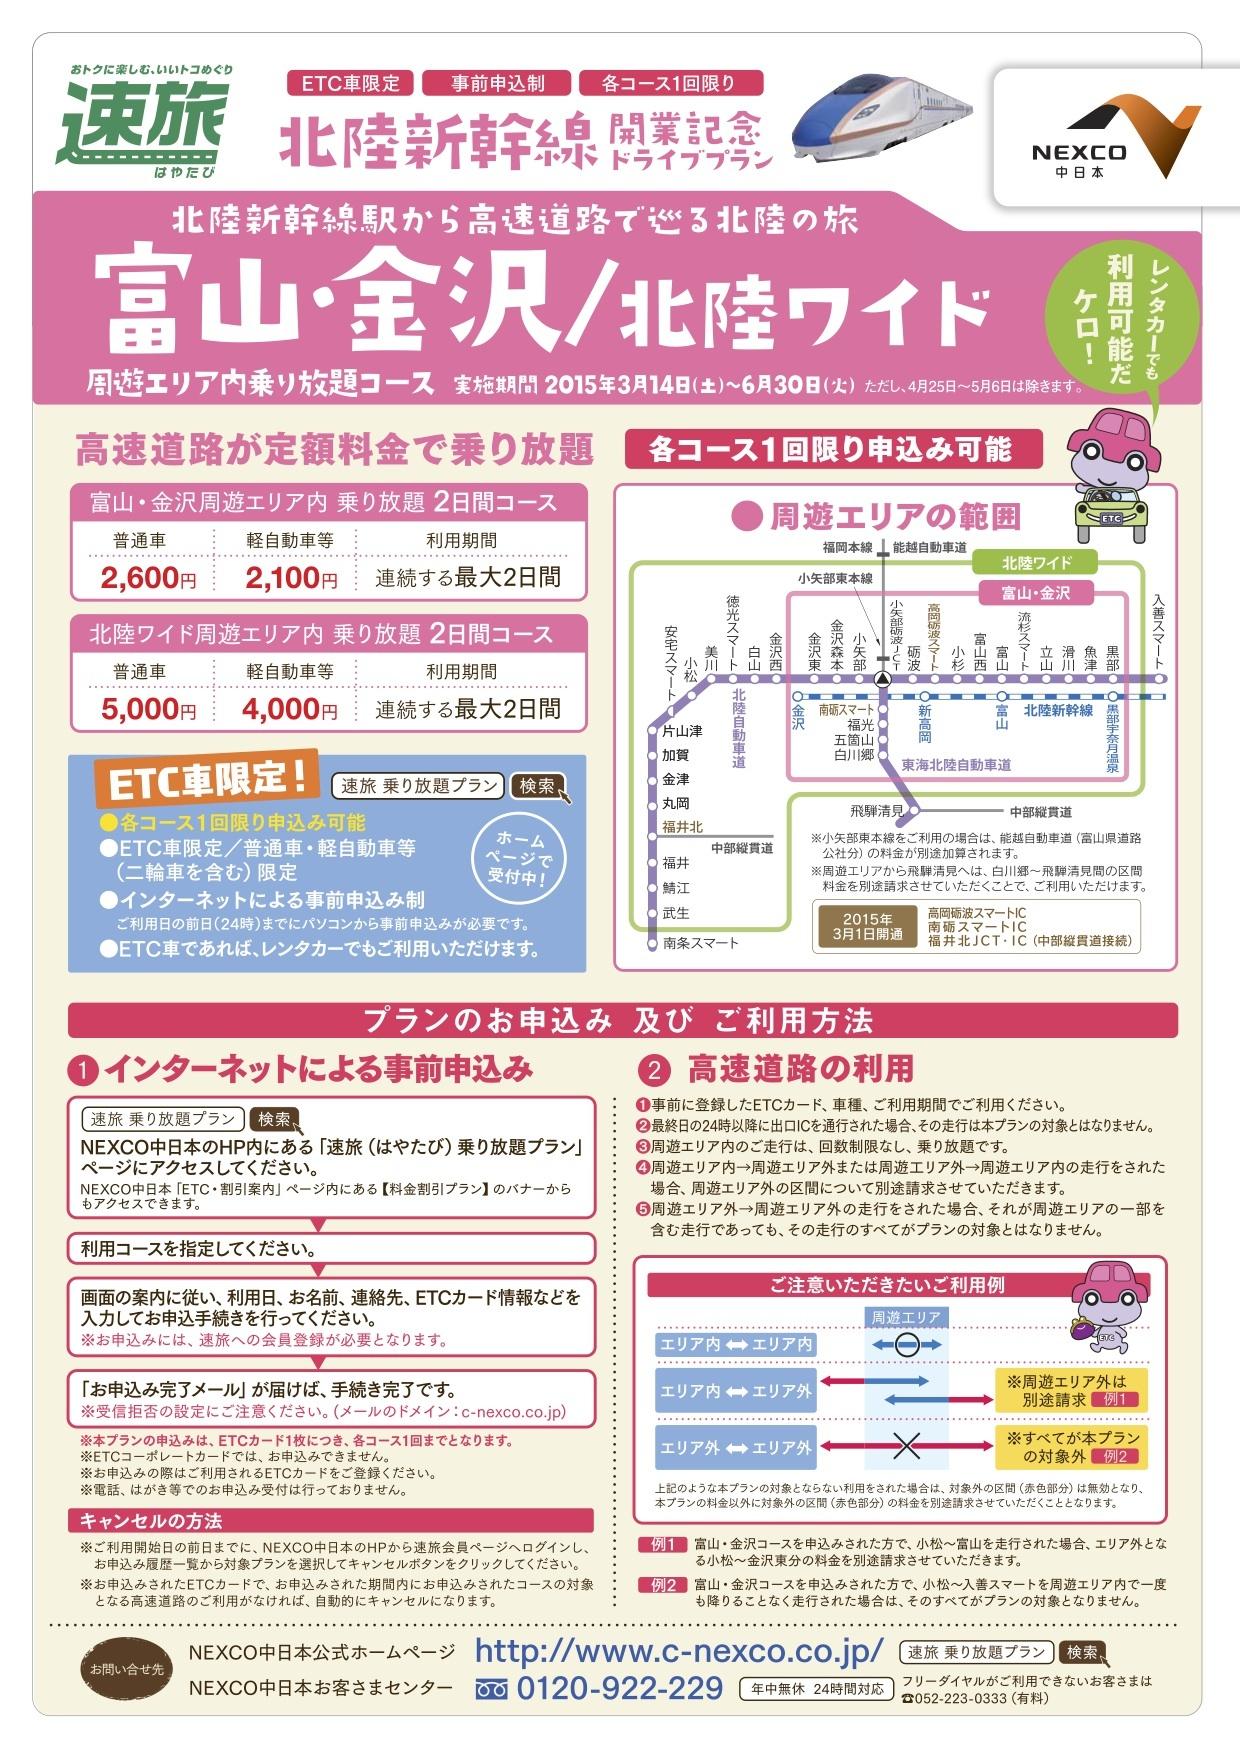 toyama_kanazawa_plan.jpg